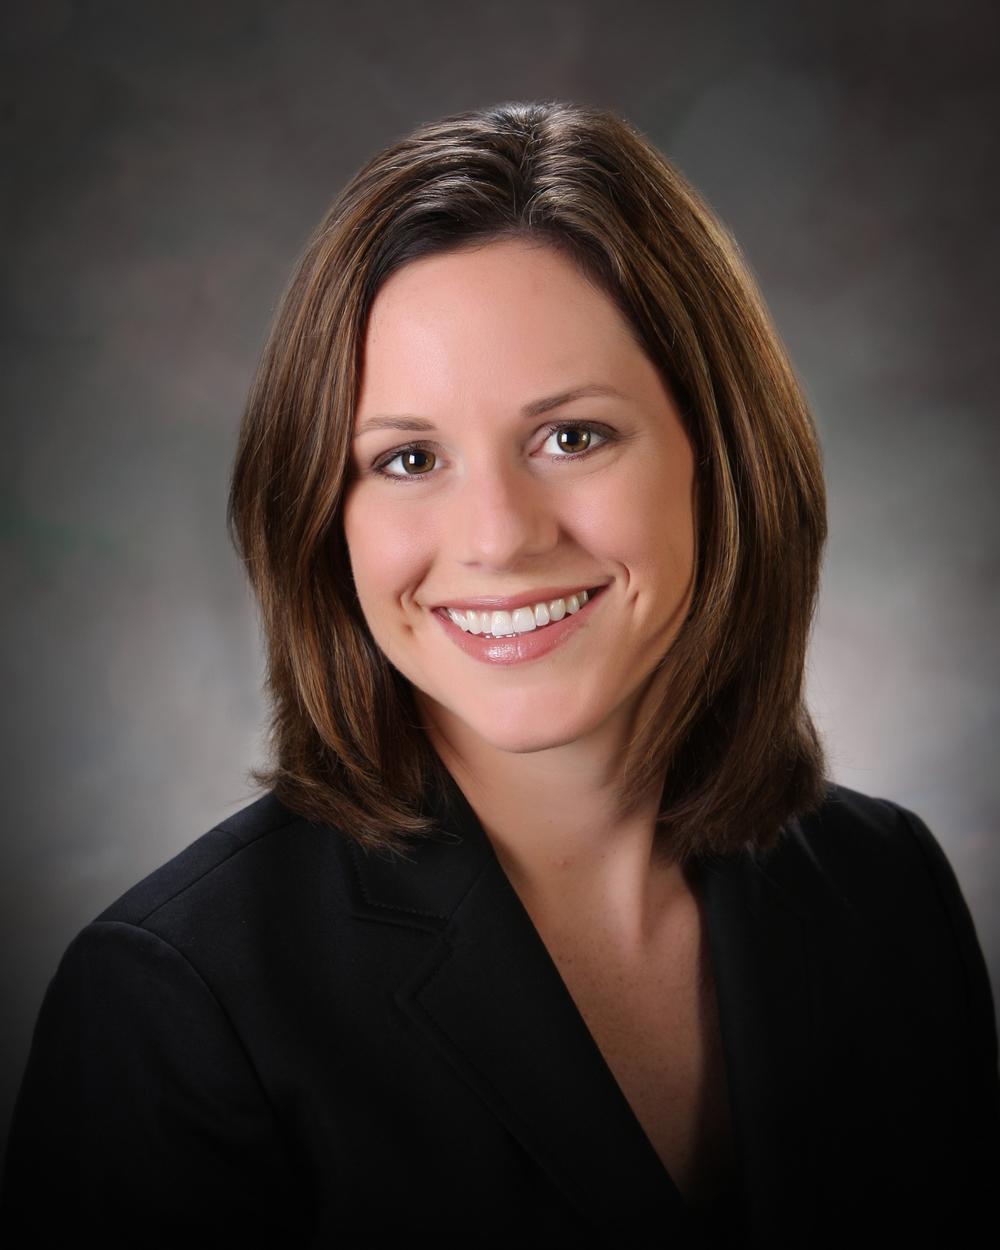 Theresa Schinke DPM